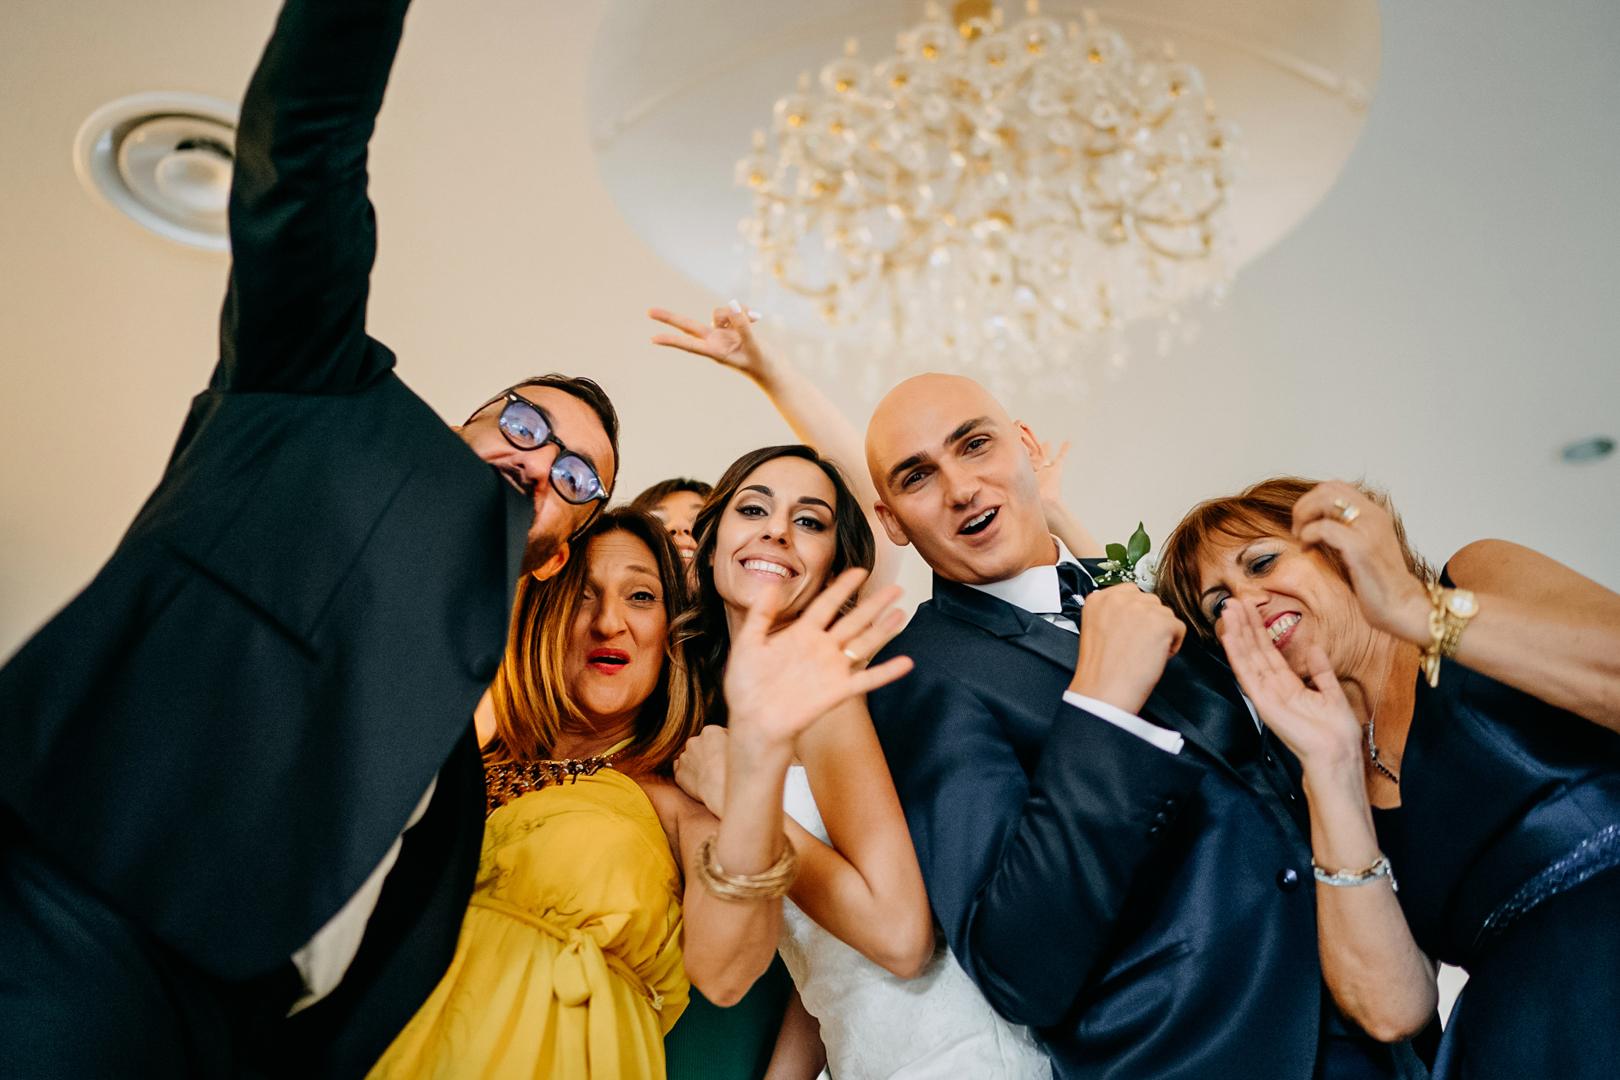 30 gianni-lepore-amici-sposi